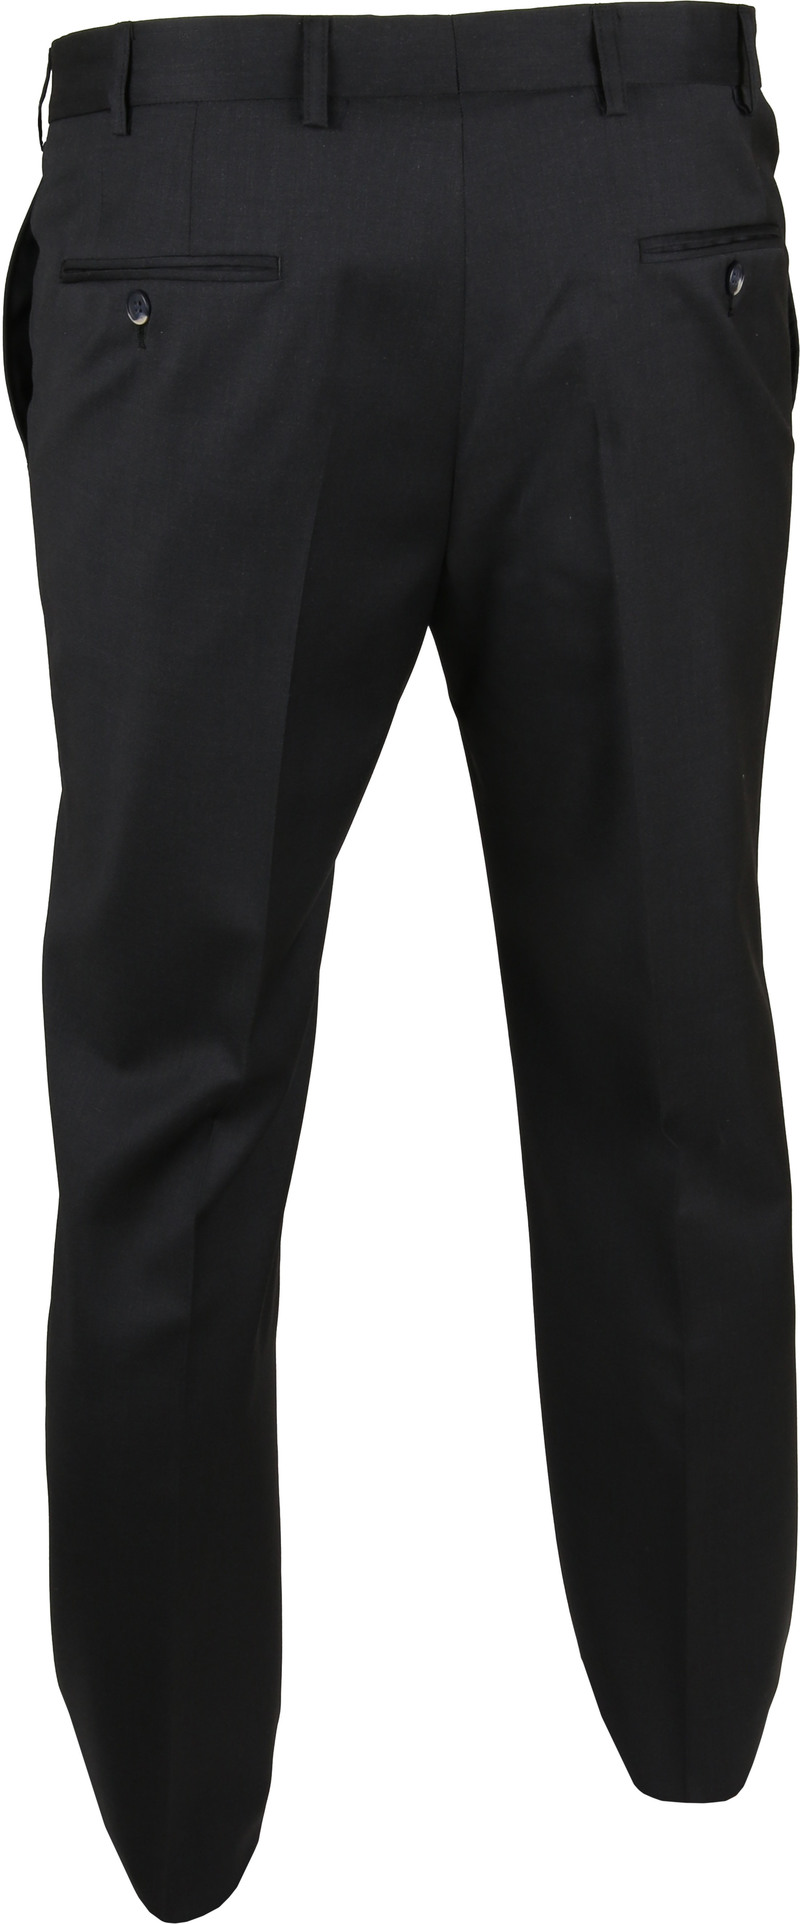 Suitable Pantalon Piga Anthracite photo 3